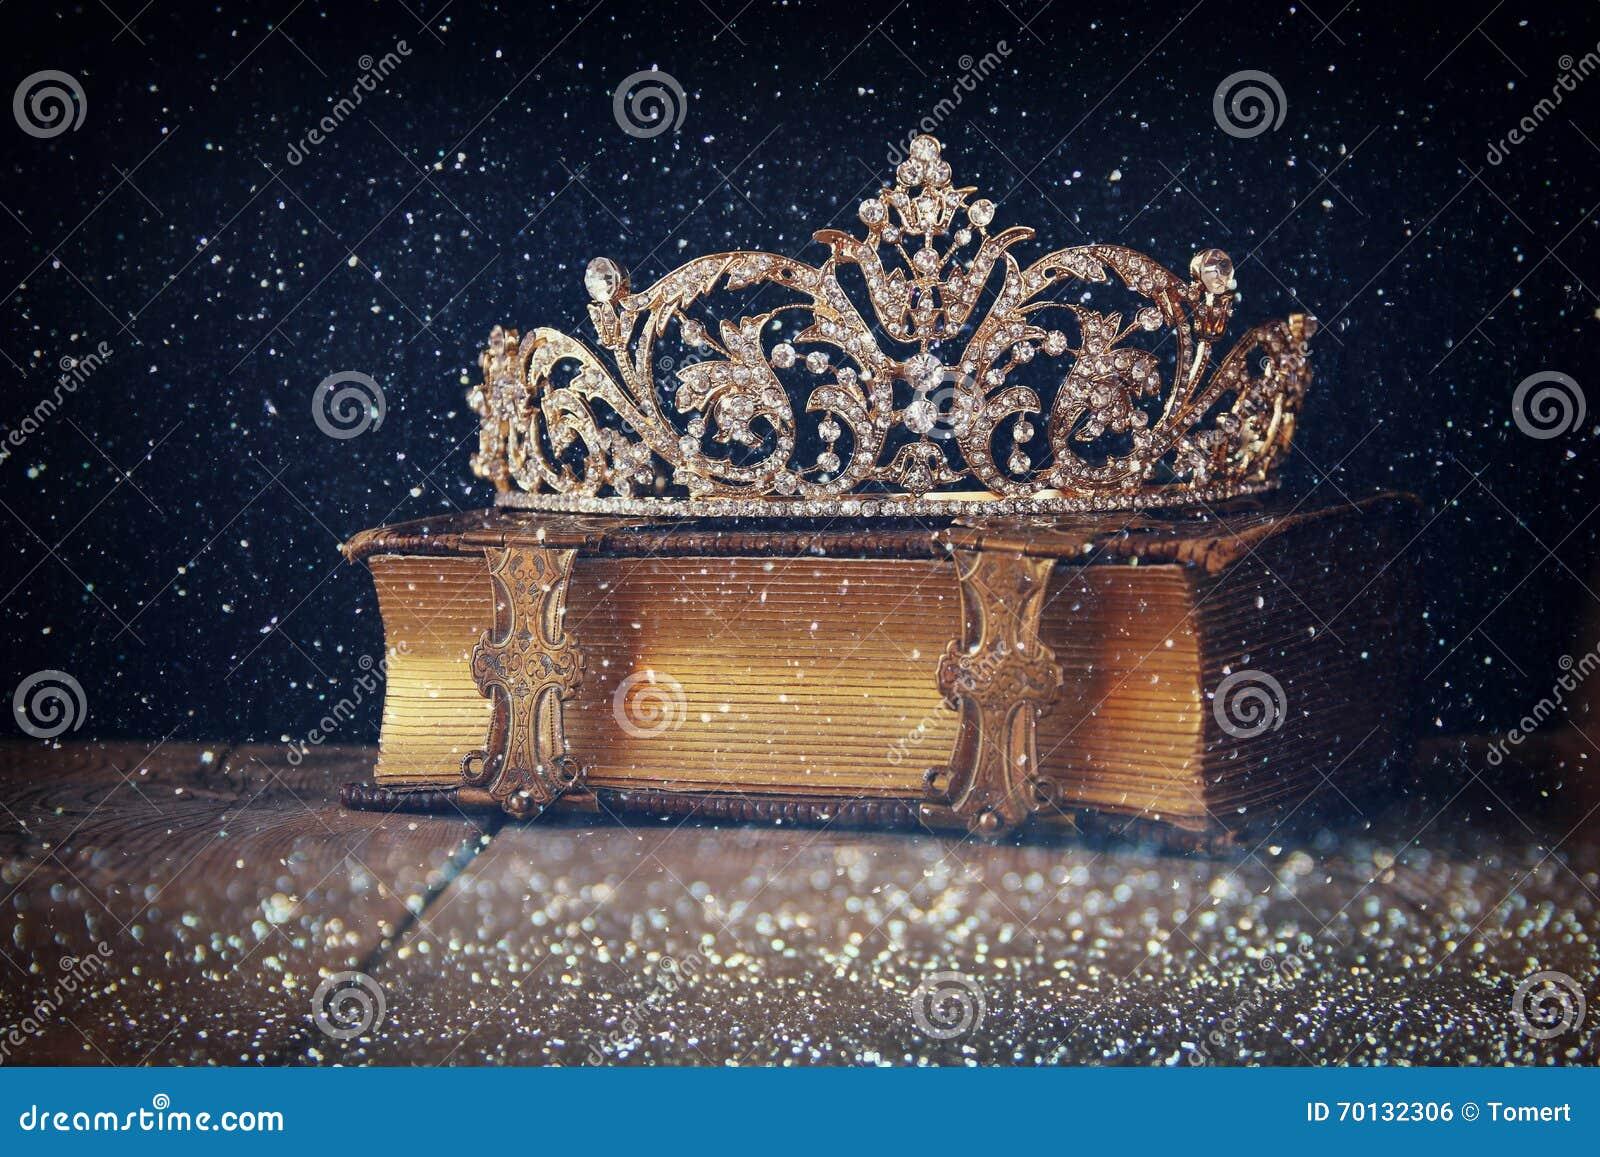 Rustig beeld van decoratieve kroon op oud boek Gefiltreerde wijnoogst